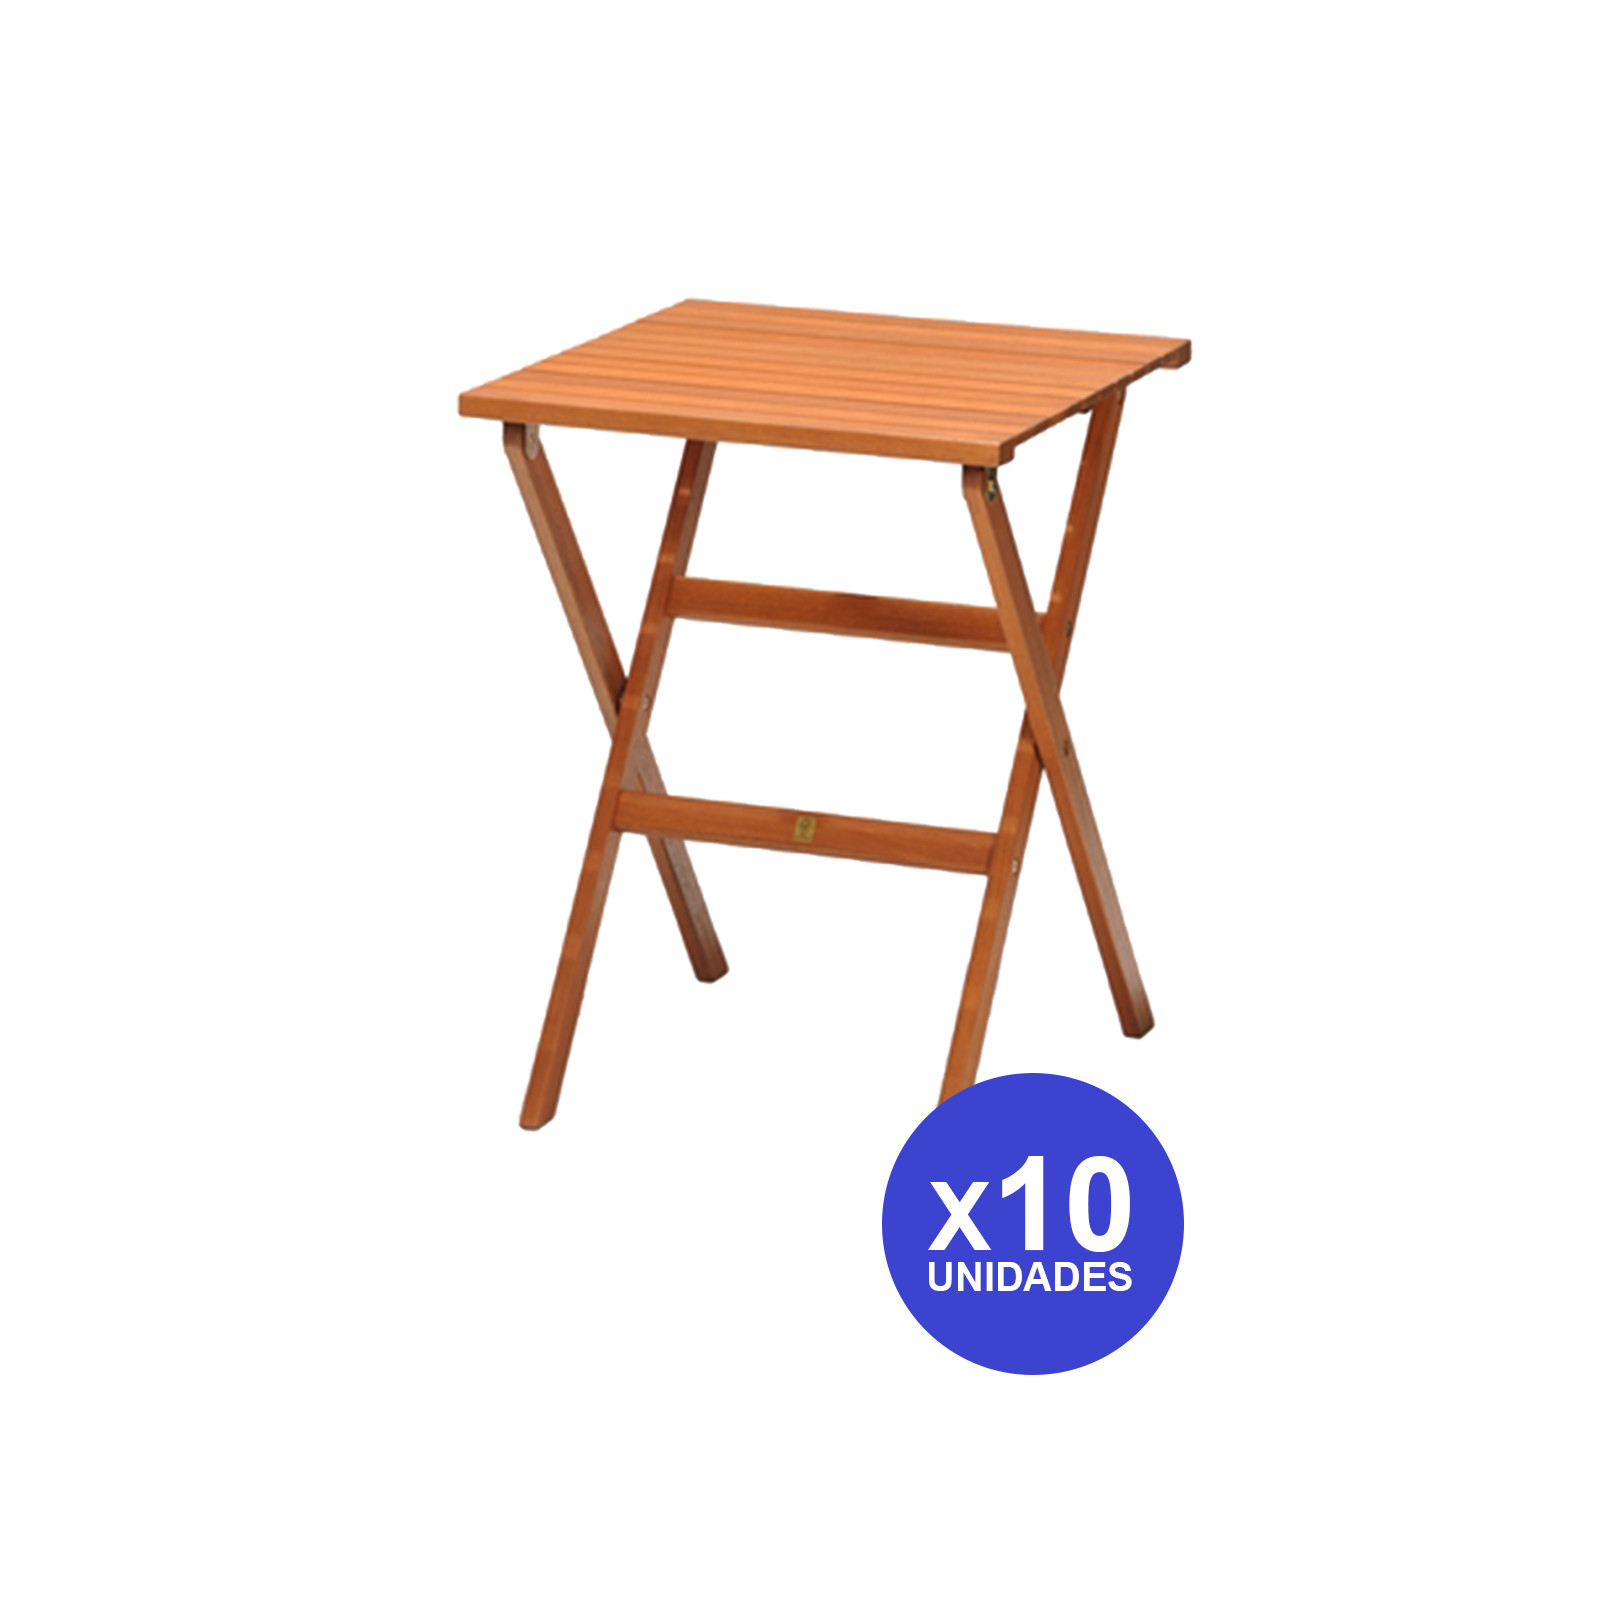 Kingsbury-10 Wooden Folding Tables Eucalyptus 56 Cm X 56 Cm-4999100100570L